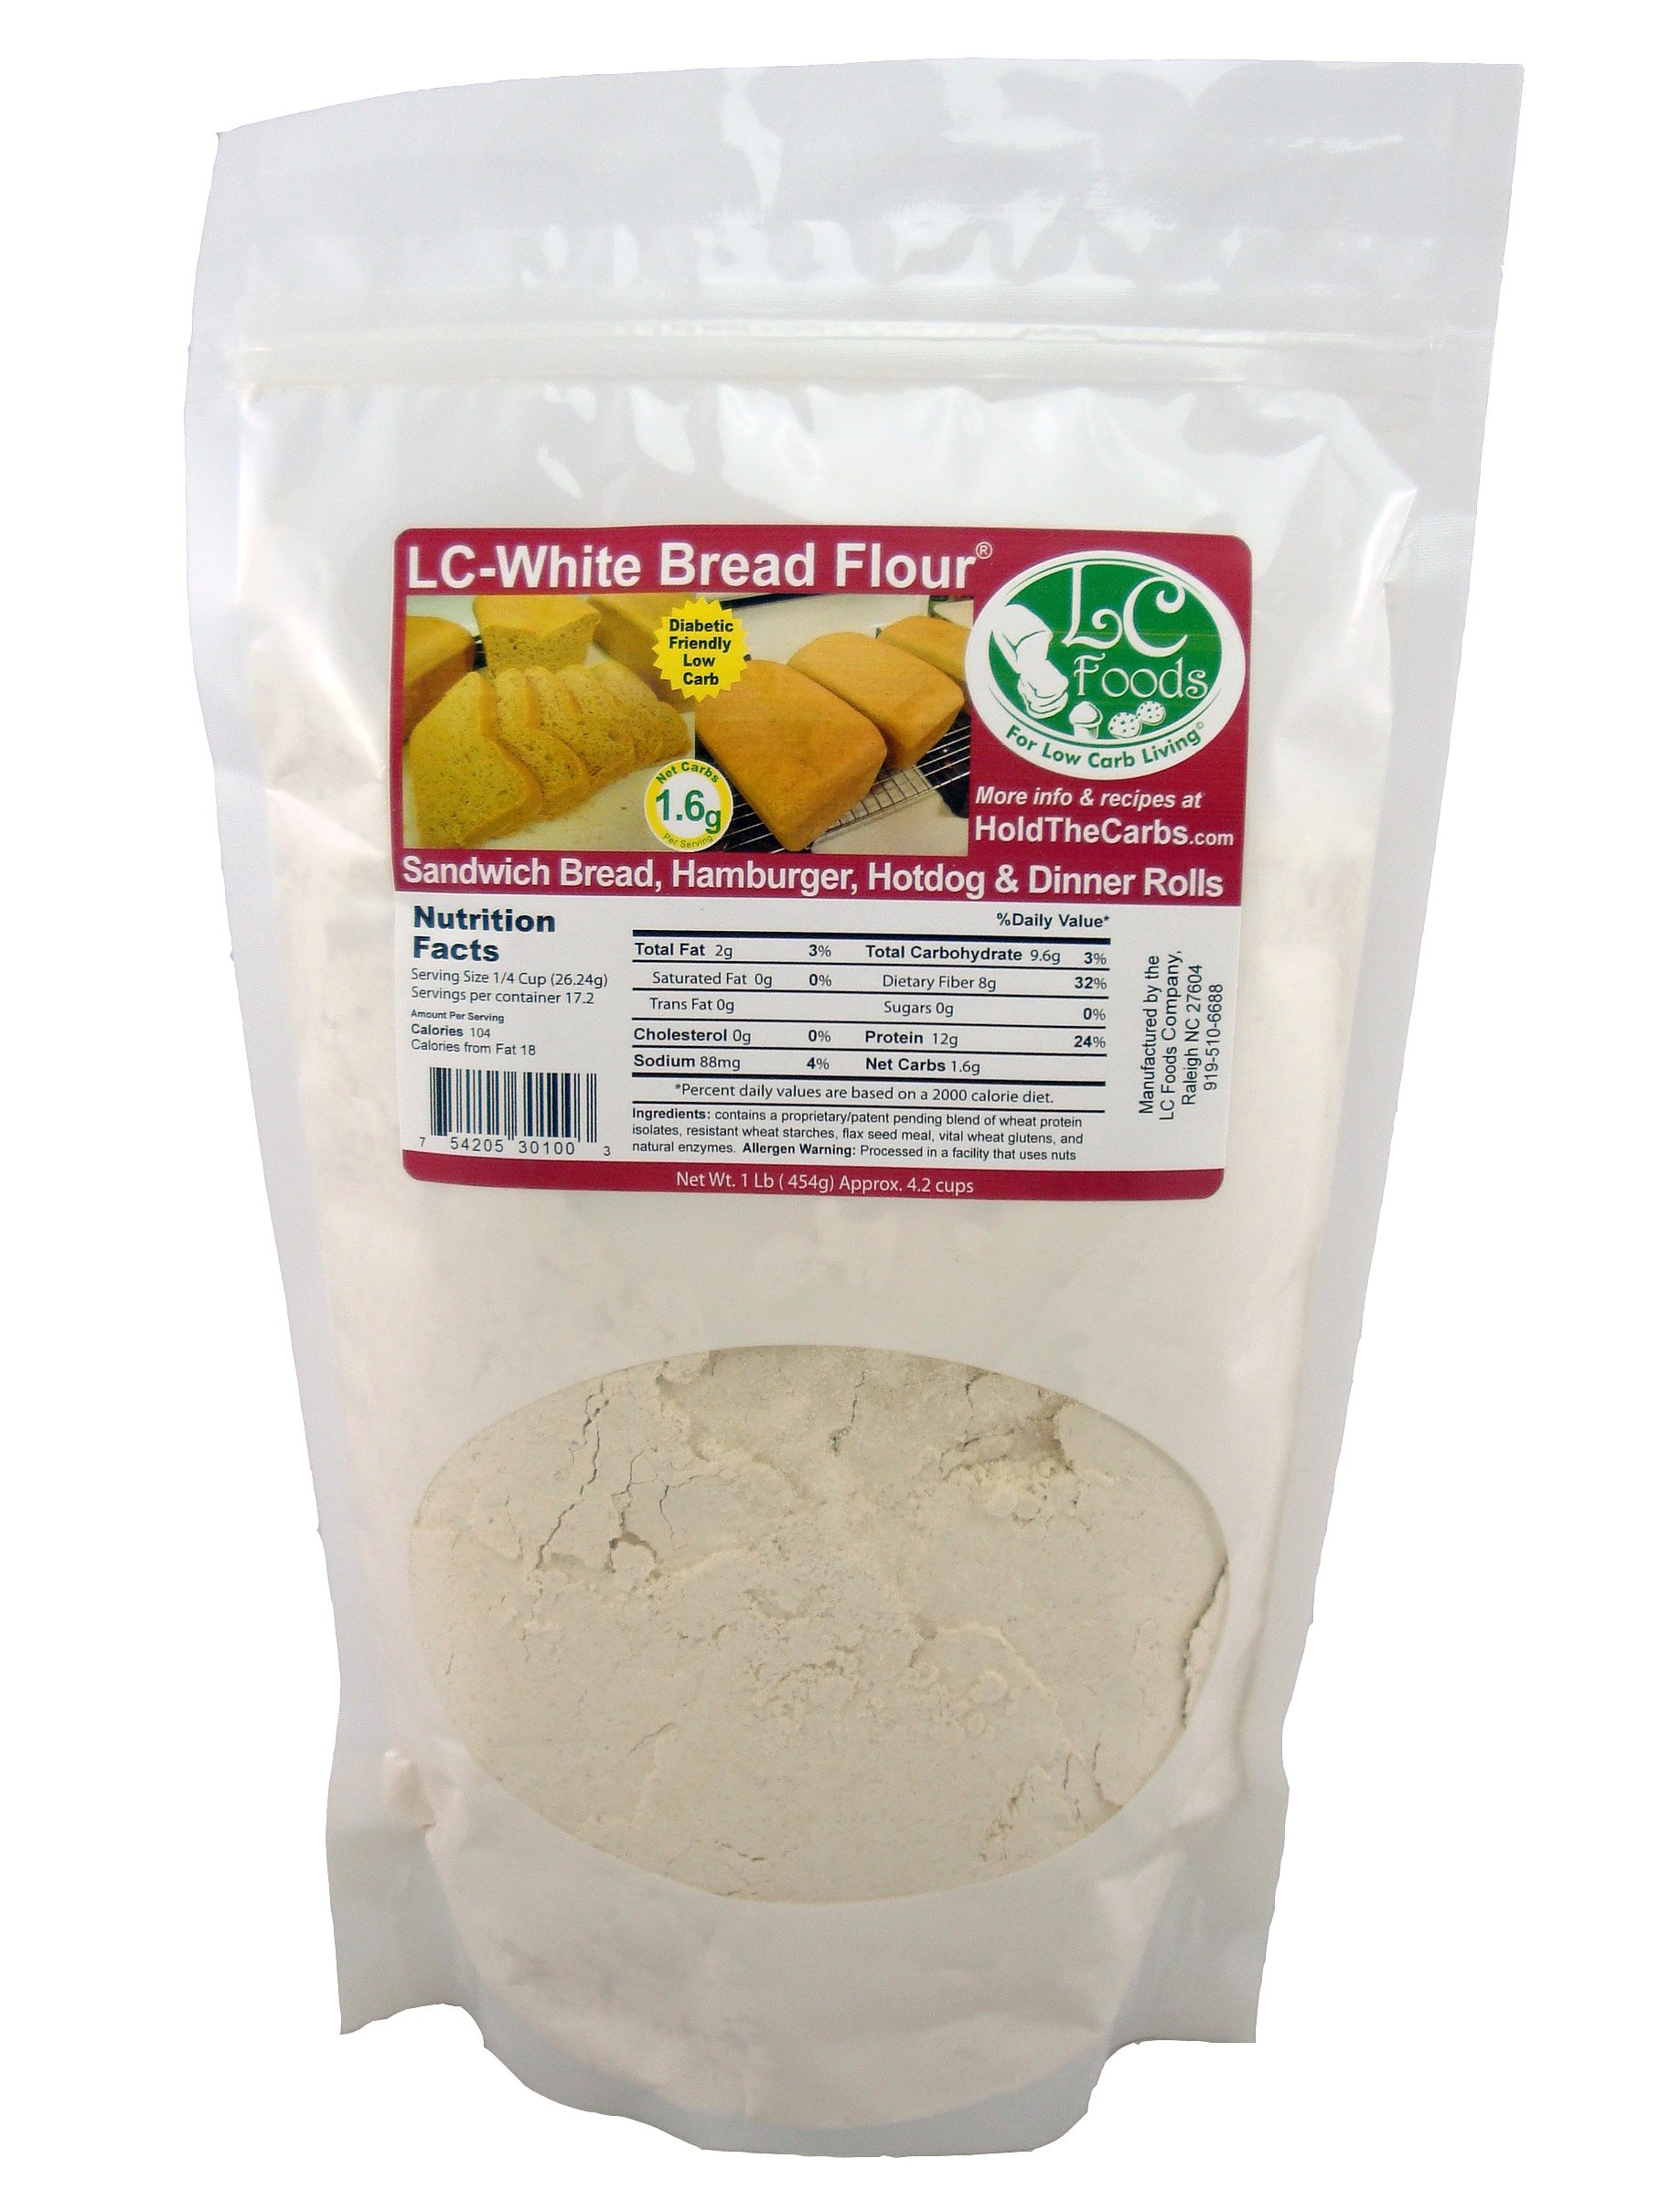 Low Carb White Bread Flour (1 LB) - LC Foods - All Natural - No Sugar - Diabetic Friendly